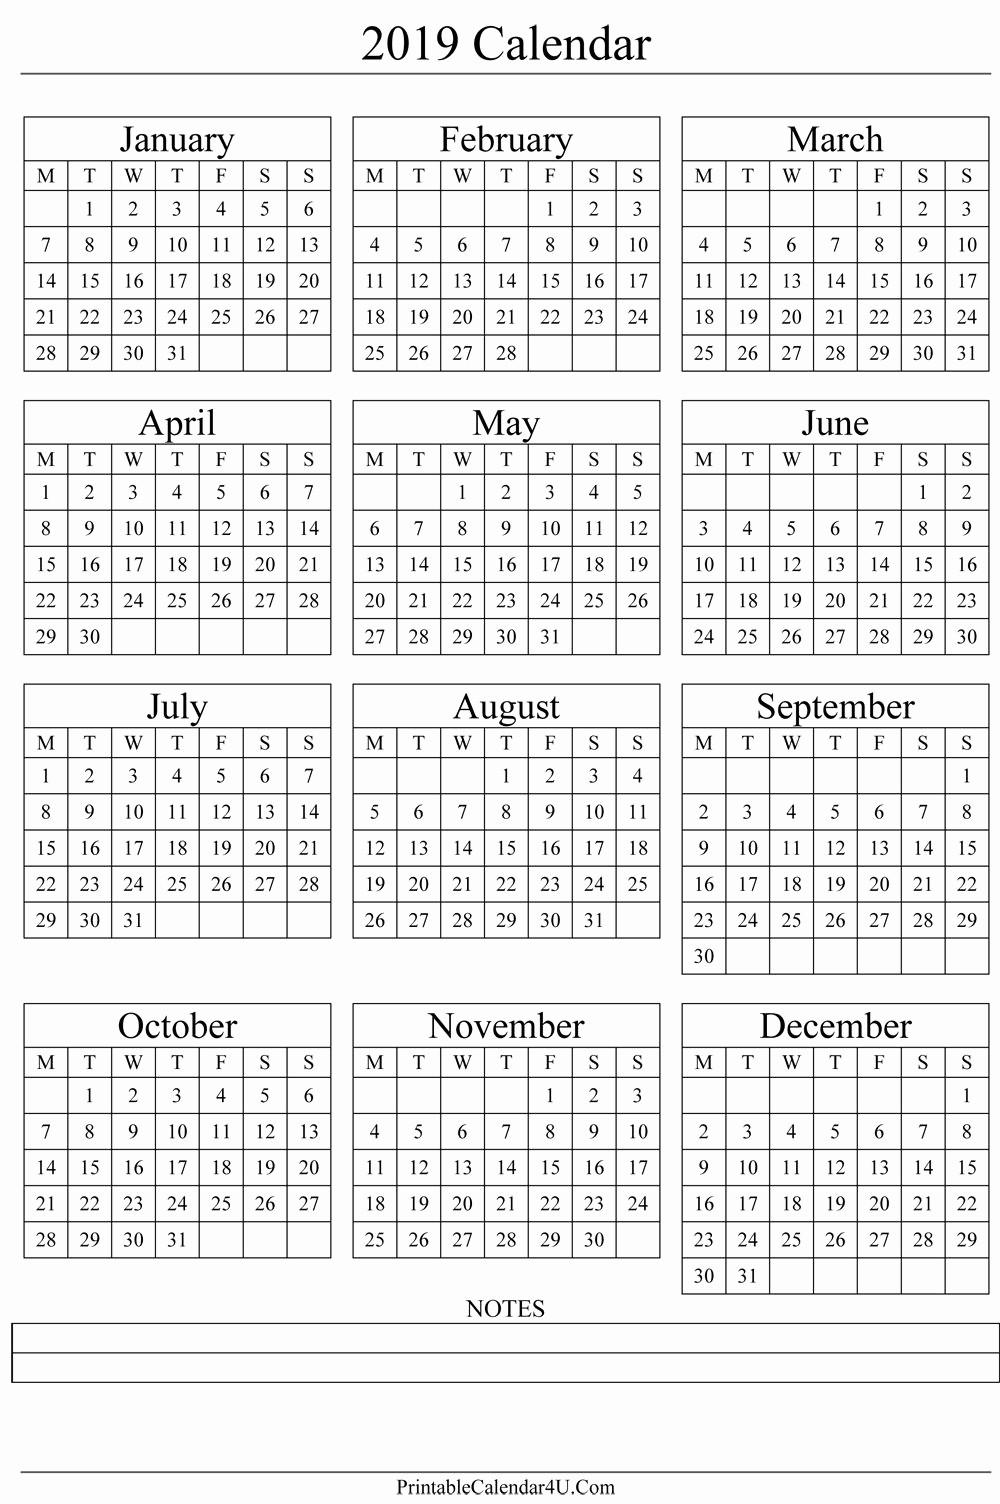 Free Printable 2019 Yearly Calendar Fresh Annual Calendar 2019 Portrait Printable Calendar 2017 2018